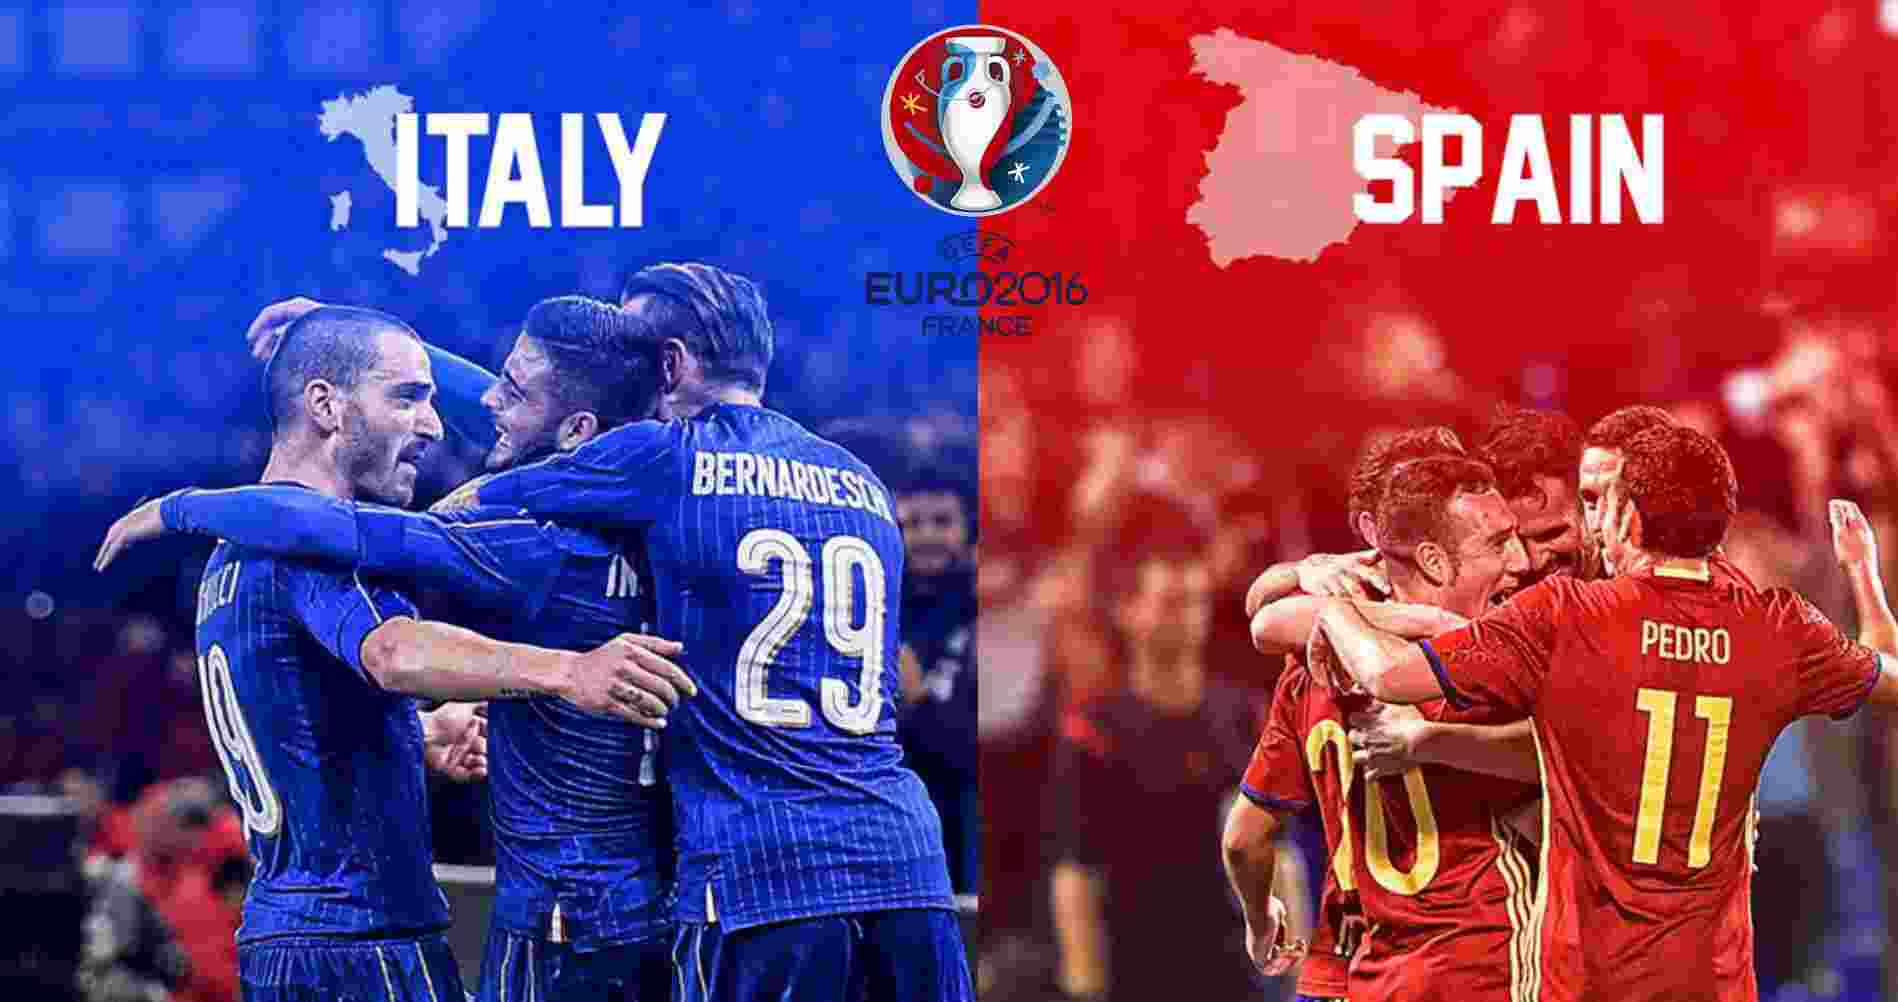 Euro 2016, Italia vs Spanyol, 27 Juni 2016 23:00WIB RCTI ...